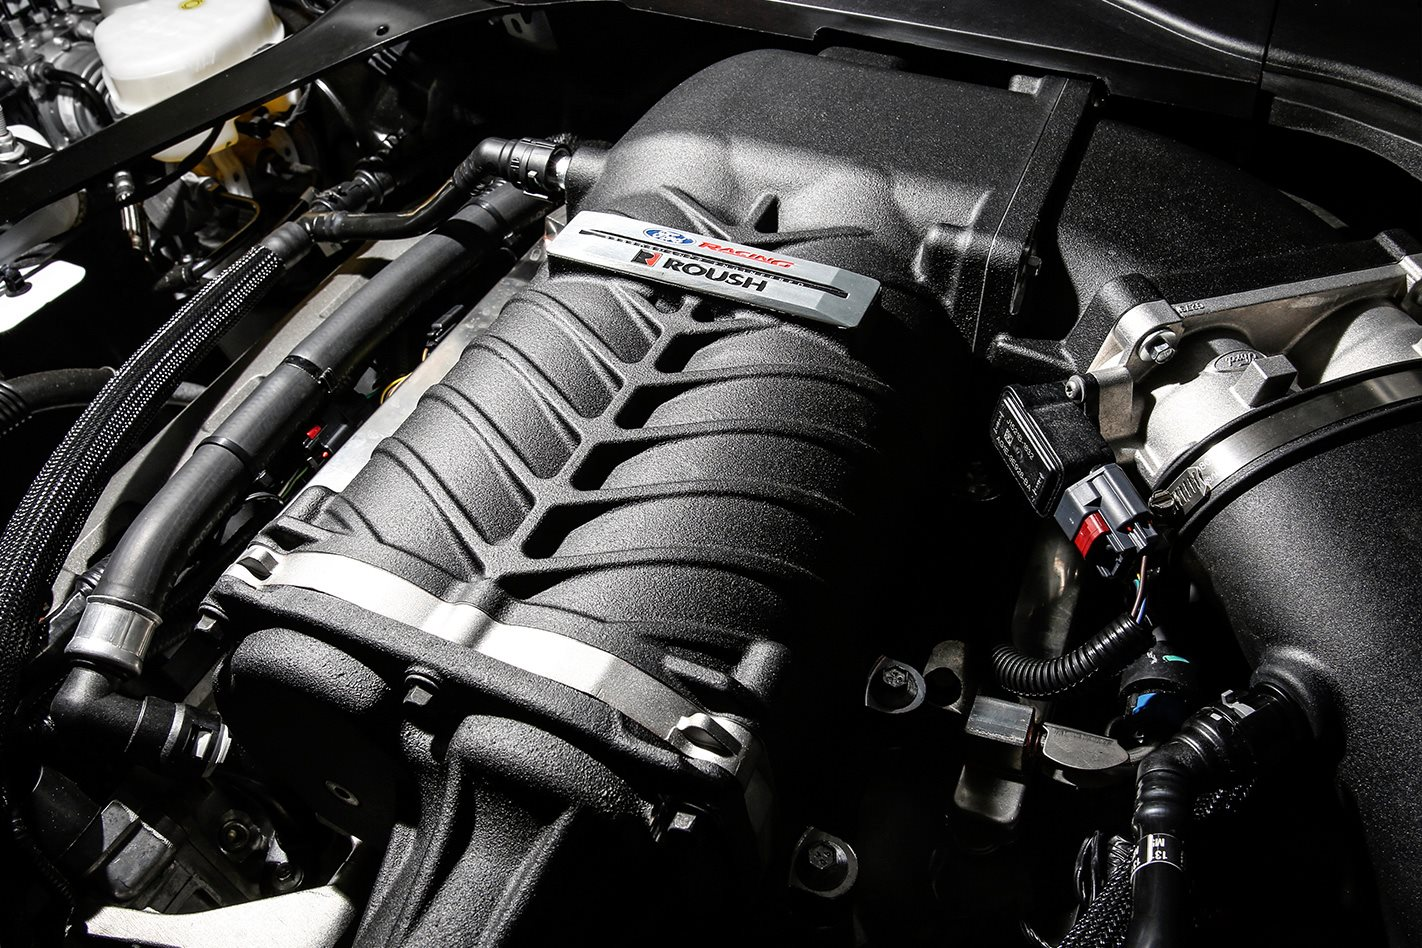 FPV Mustang engine